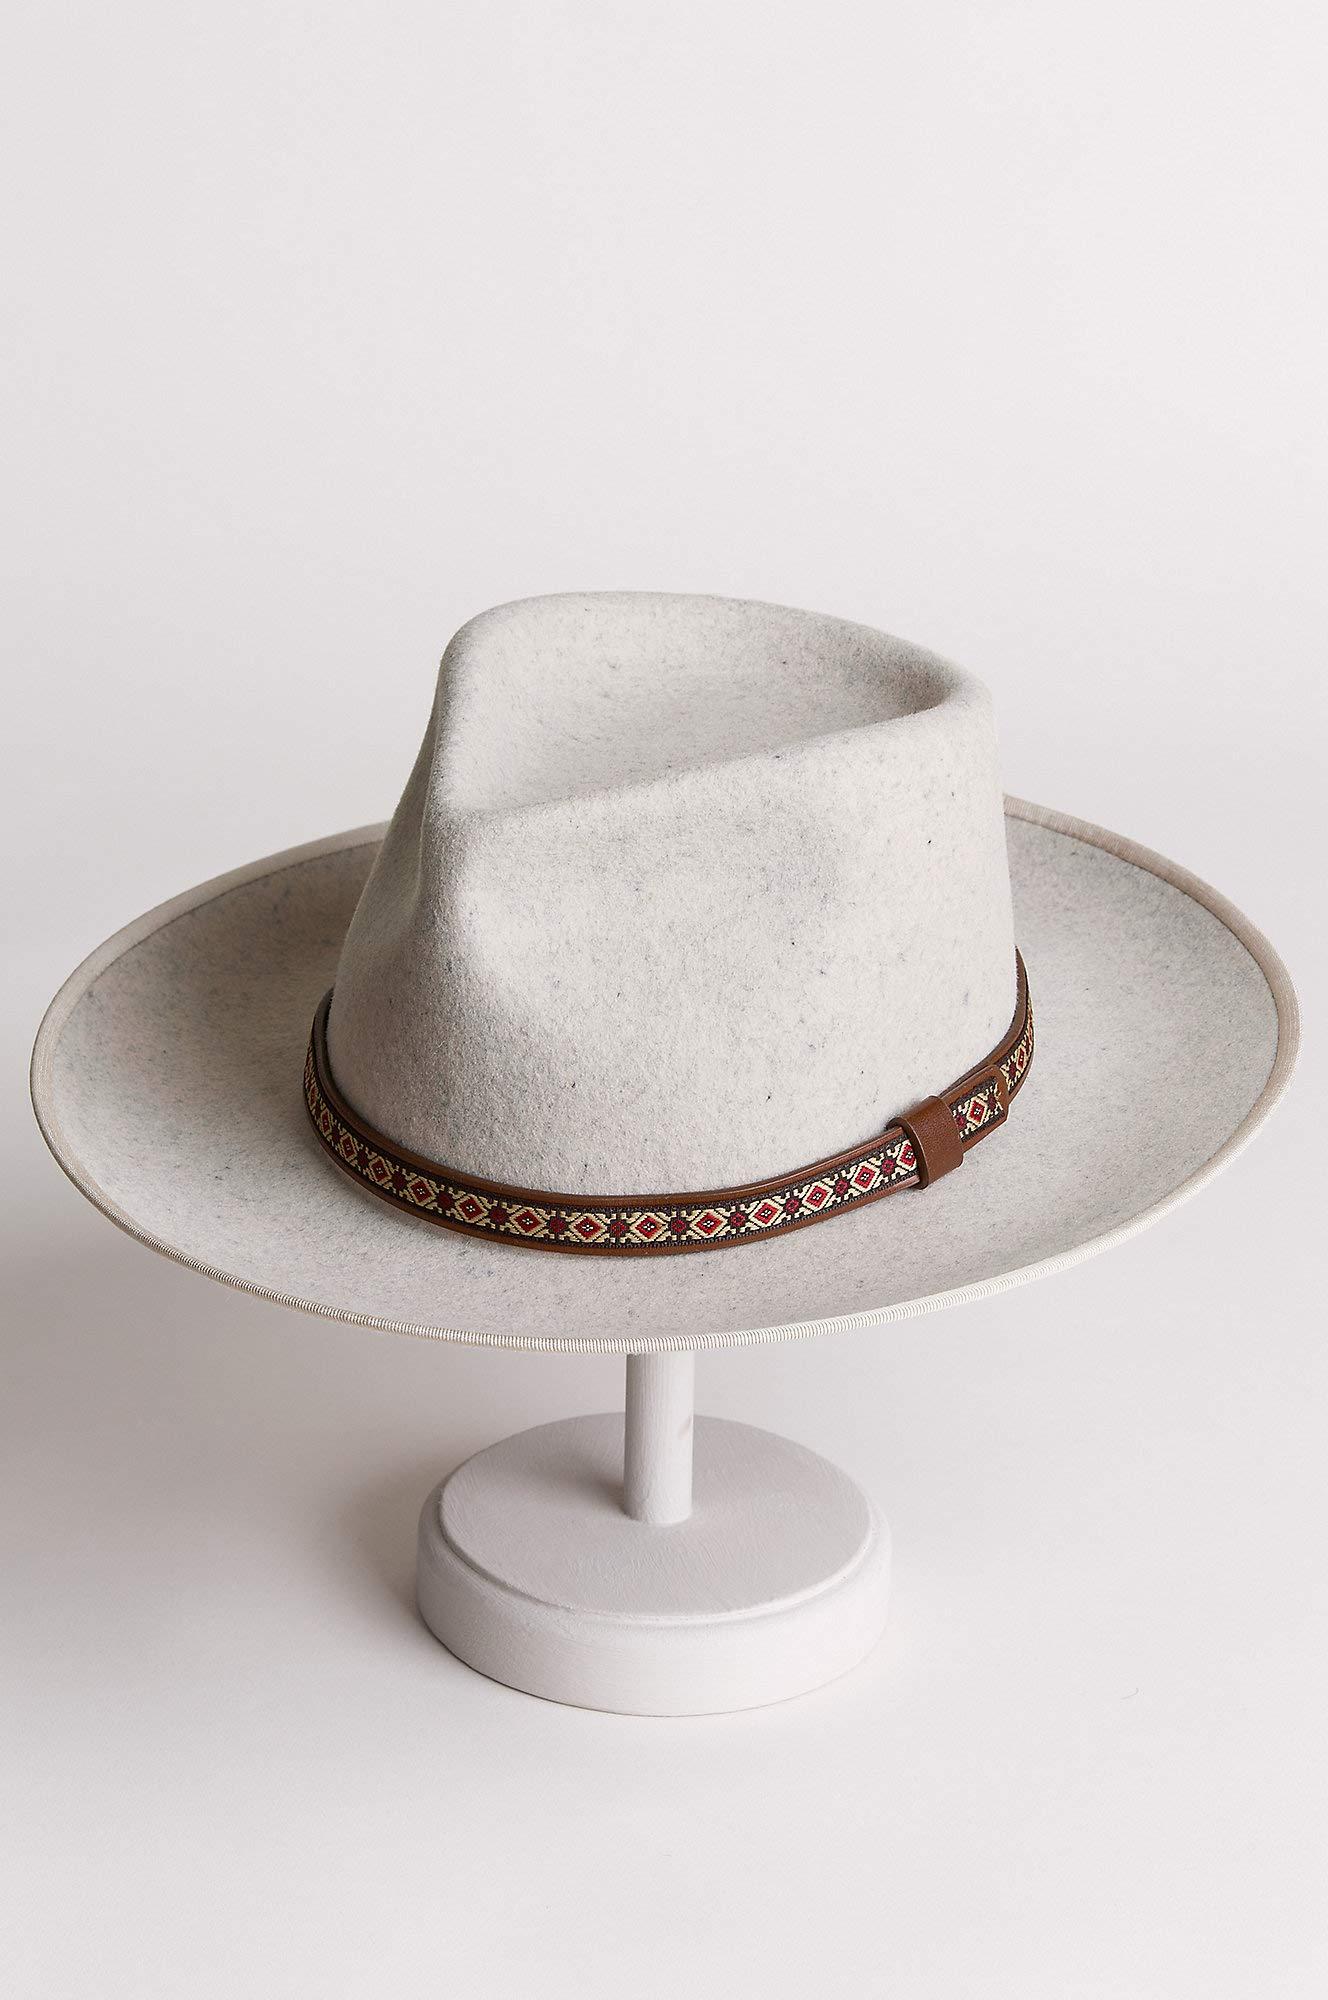 Overland Sheepskin Co Alpes Wide Brim Wool Felt Fedora Hat by Overland Sheepskin Co (Image #3)